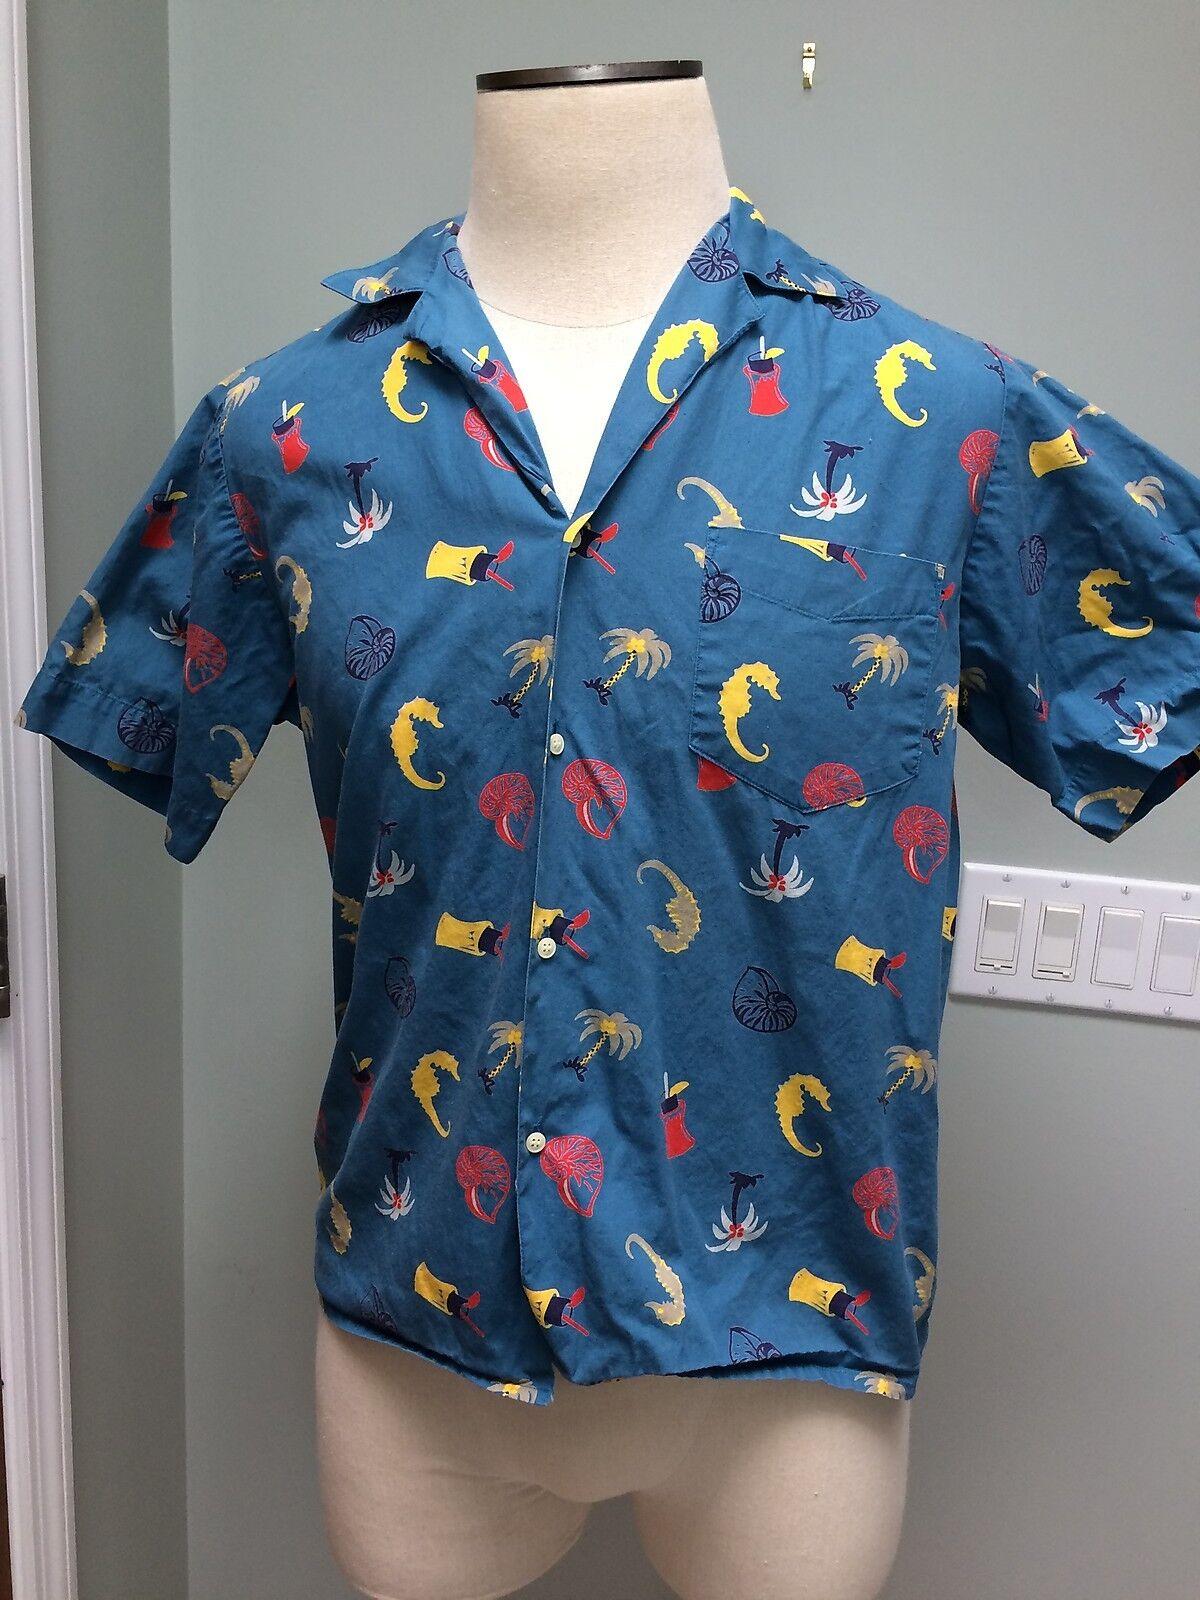 M - RARE Vtg Vtg RARE Izod Lacoste S/S Hawaiian Shirt Tiki Tropical Cotton 1970's bb6d43